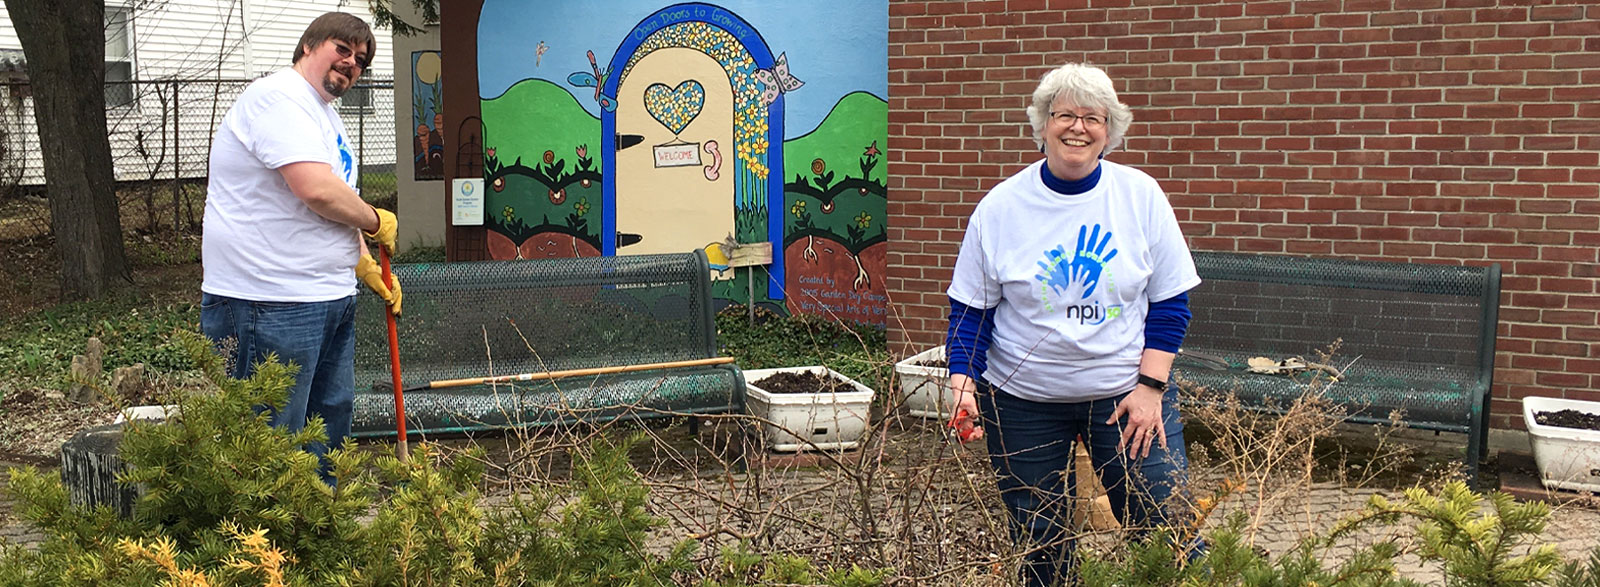 NPI encourages volunteer